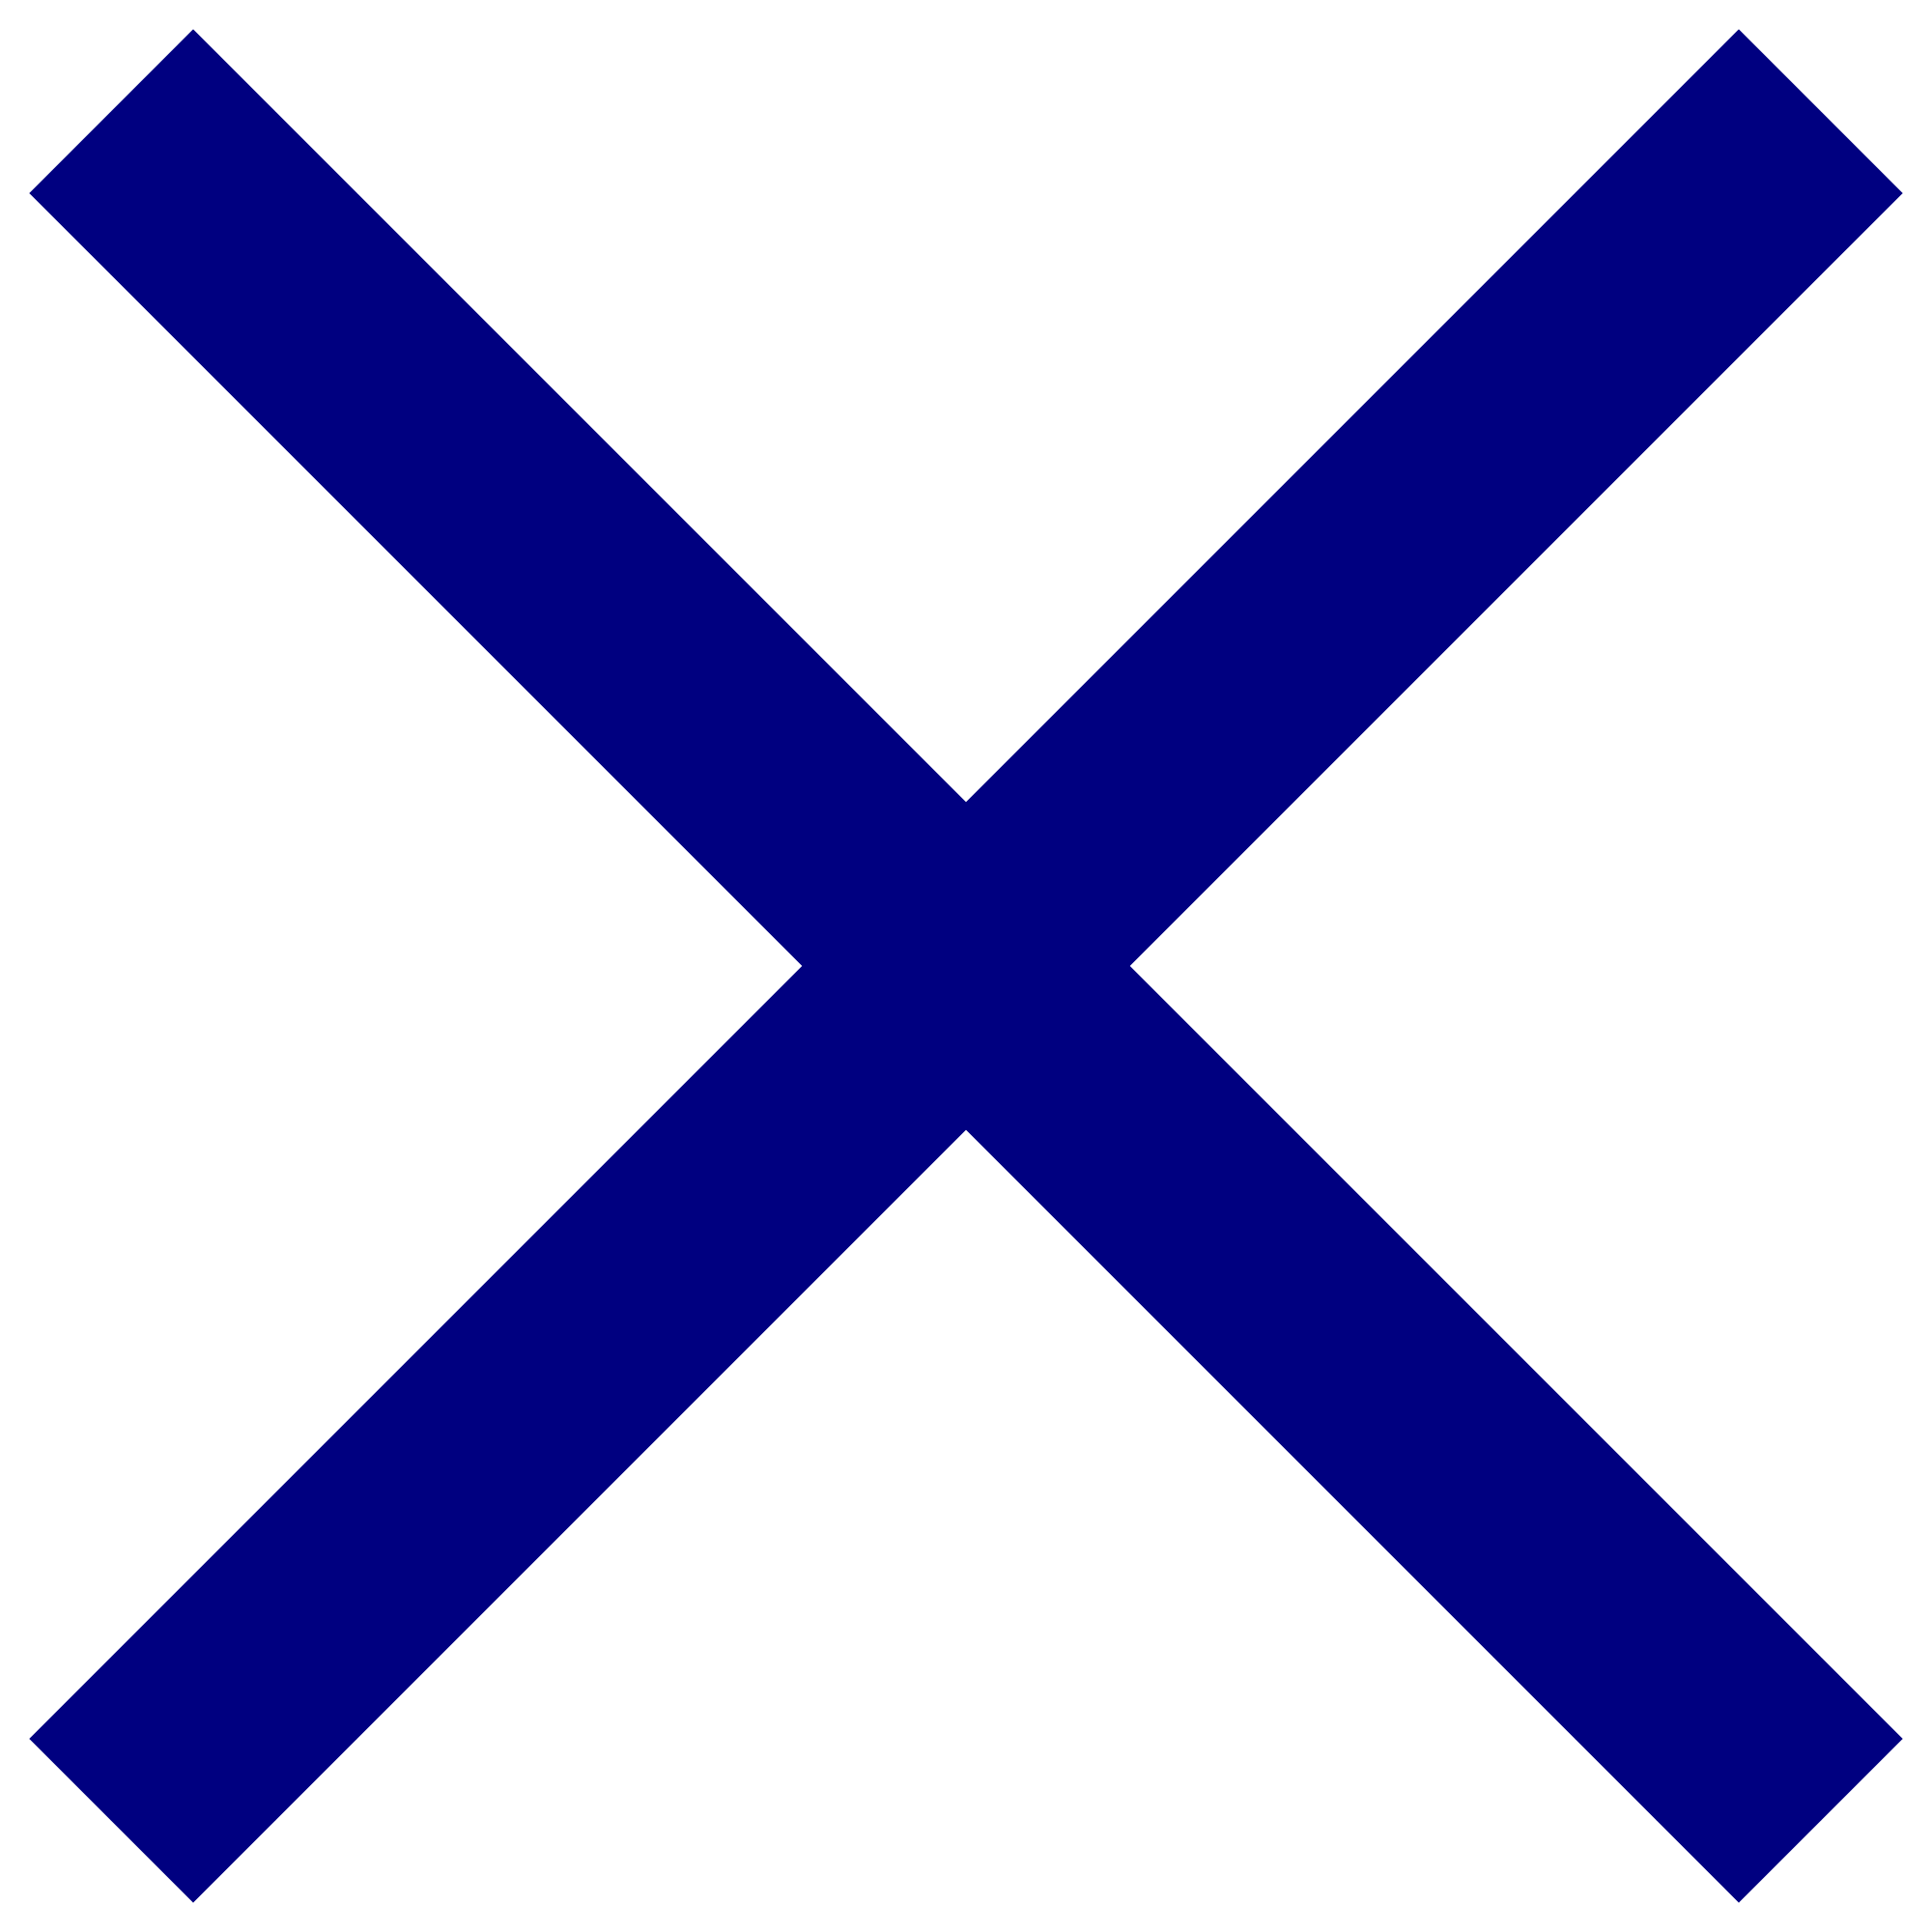 File:Saint Andrew's cross.svg.